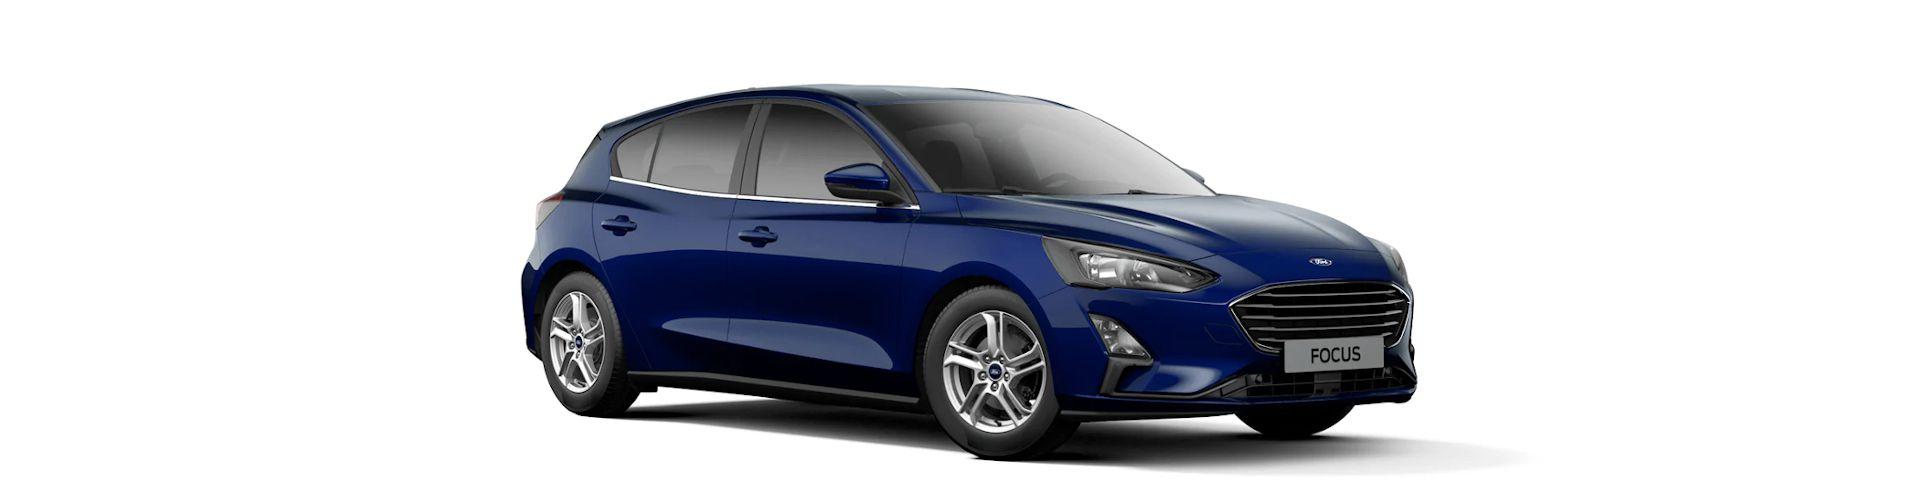 Ford Focus Business - Α. Λιάπης Αντιπροσωπεία